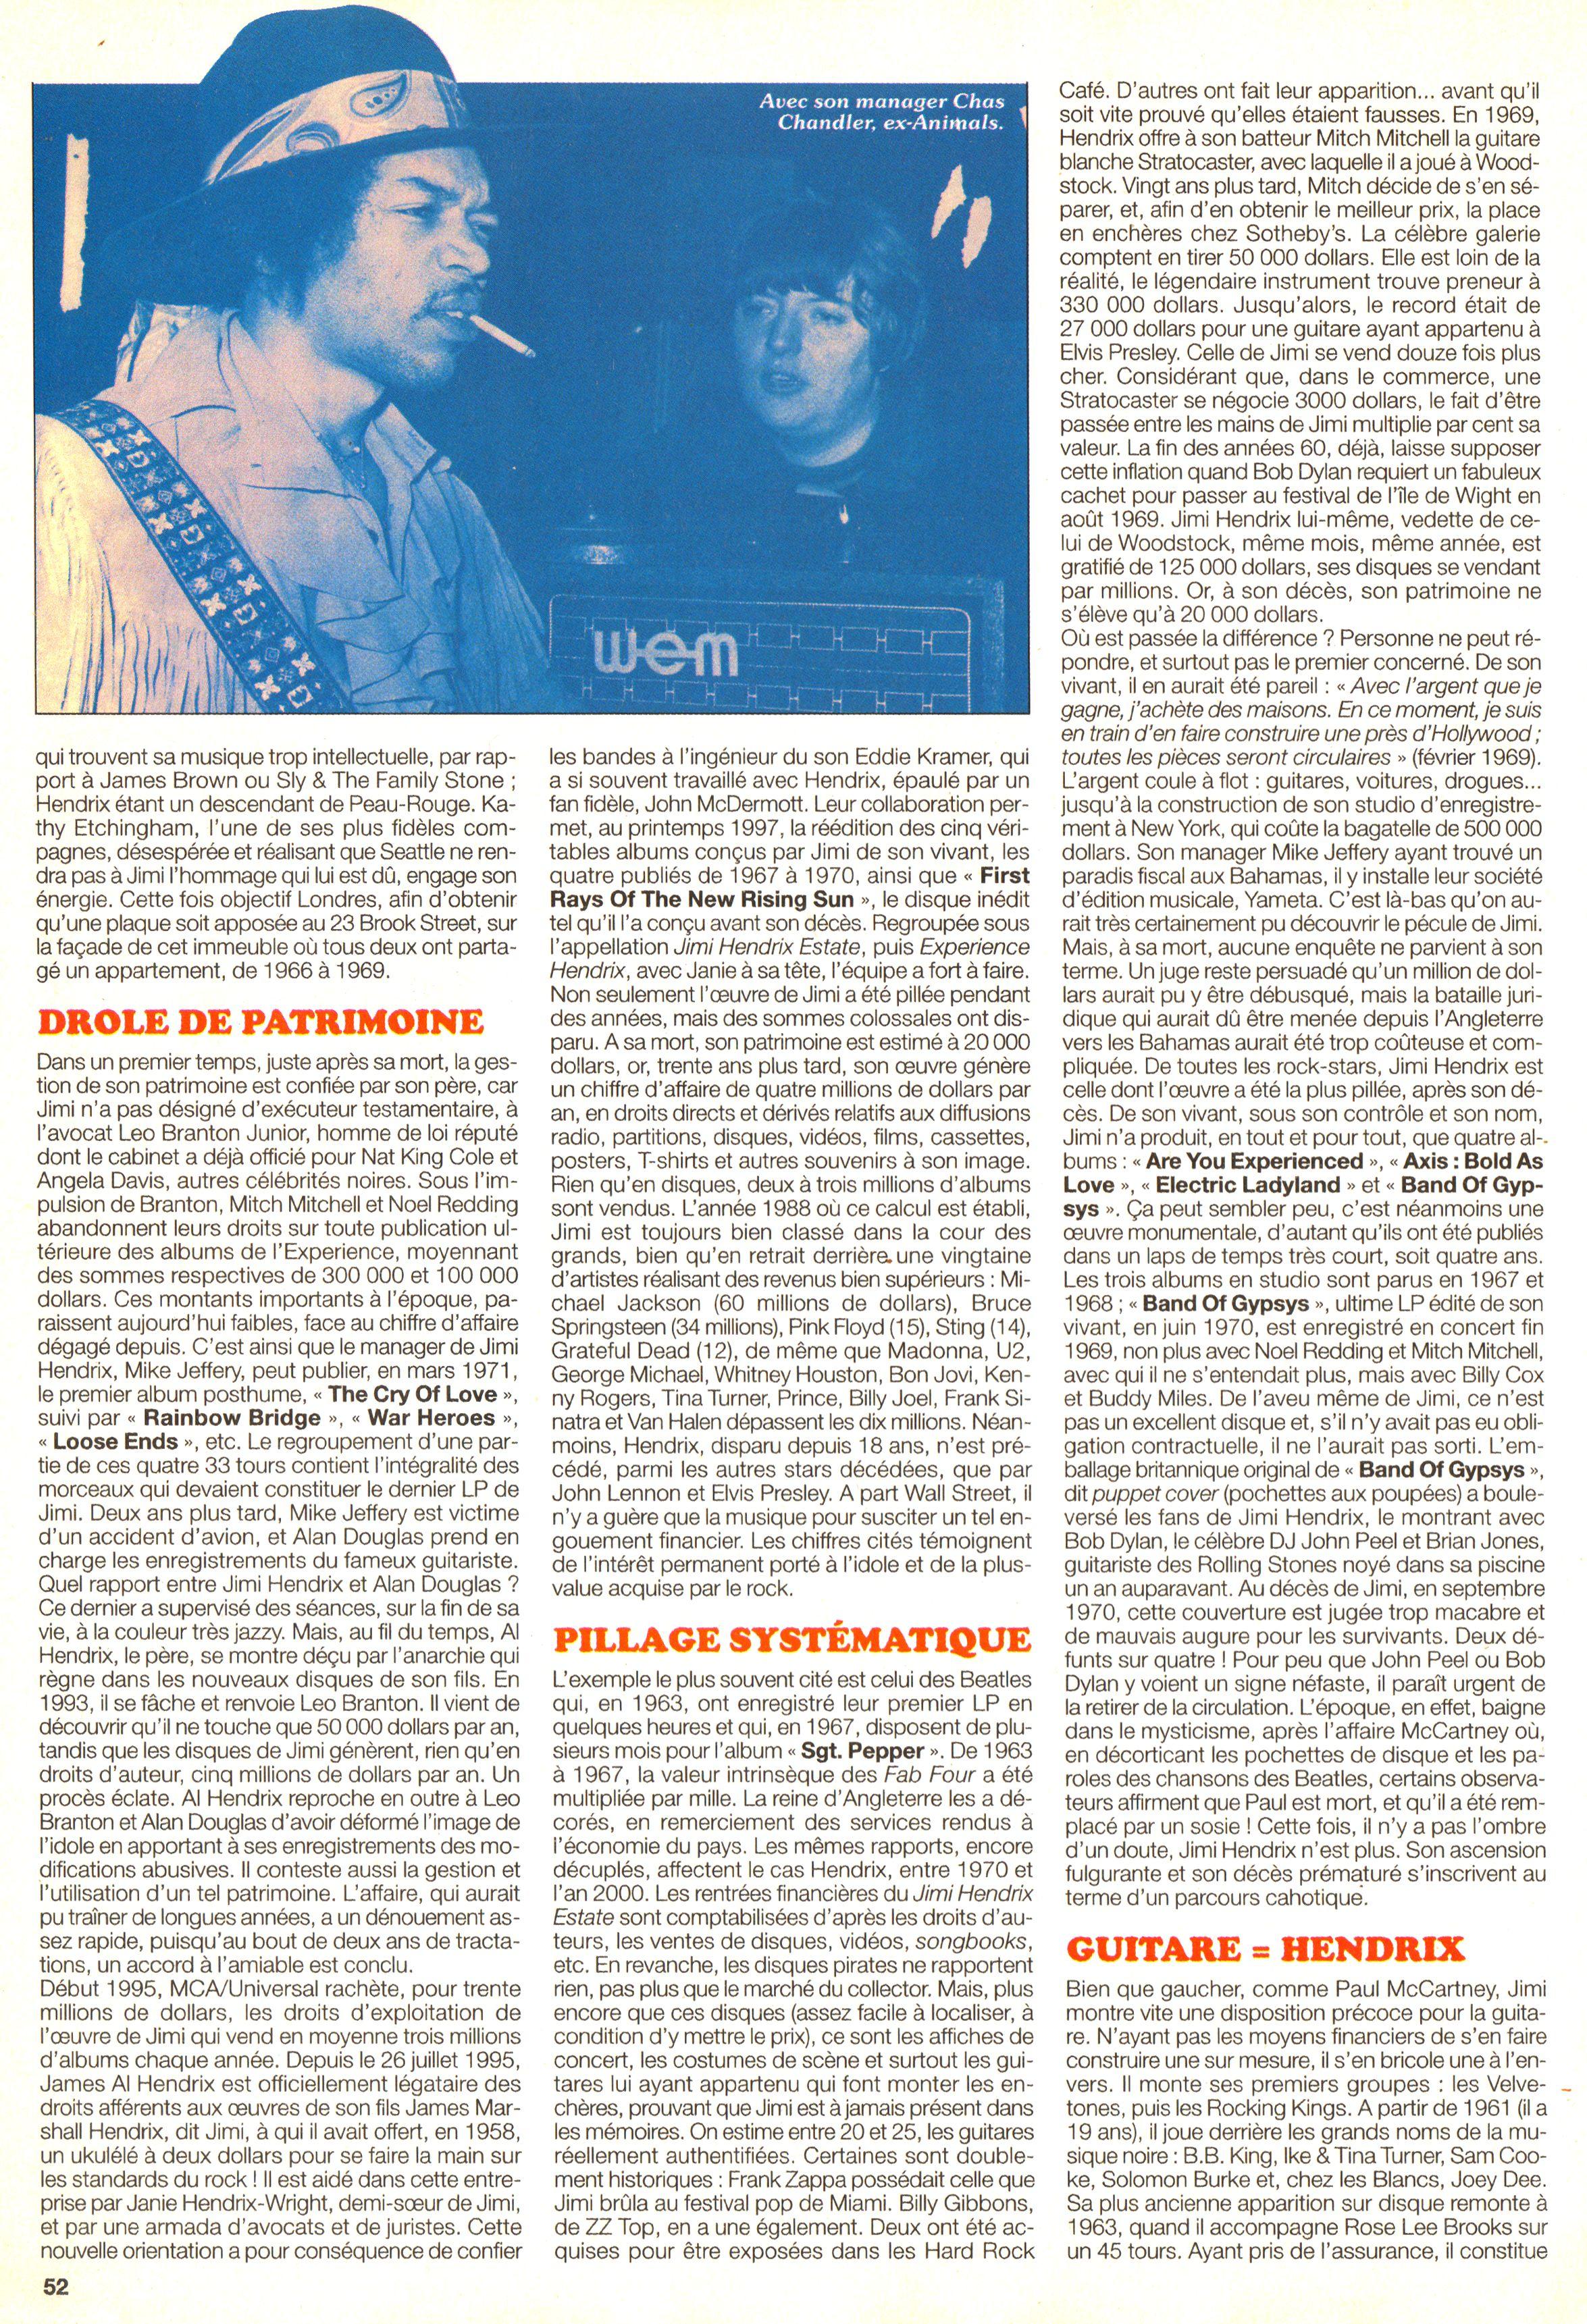 Magazines Français 1989 - 2014 JukeBoxSeptembre2000Page52